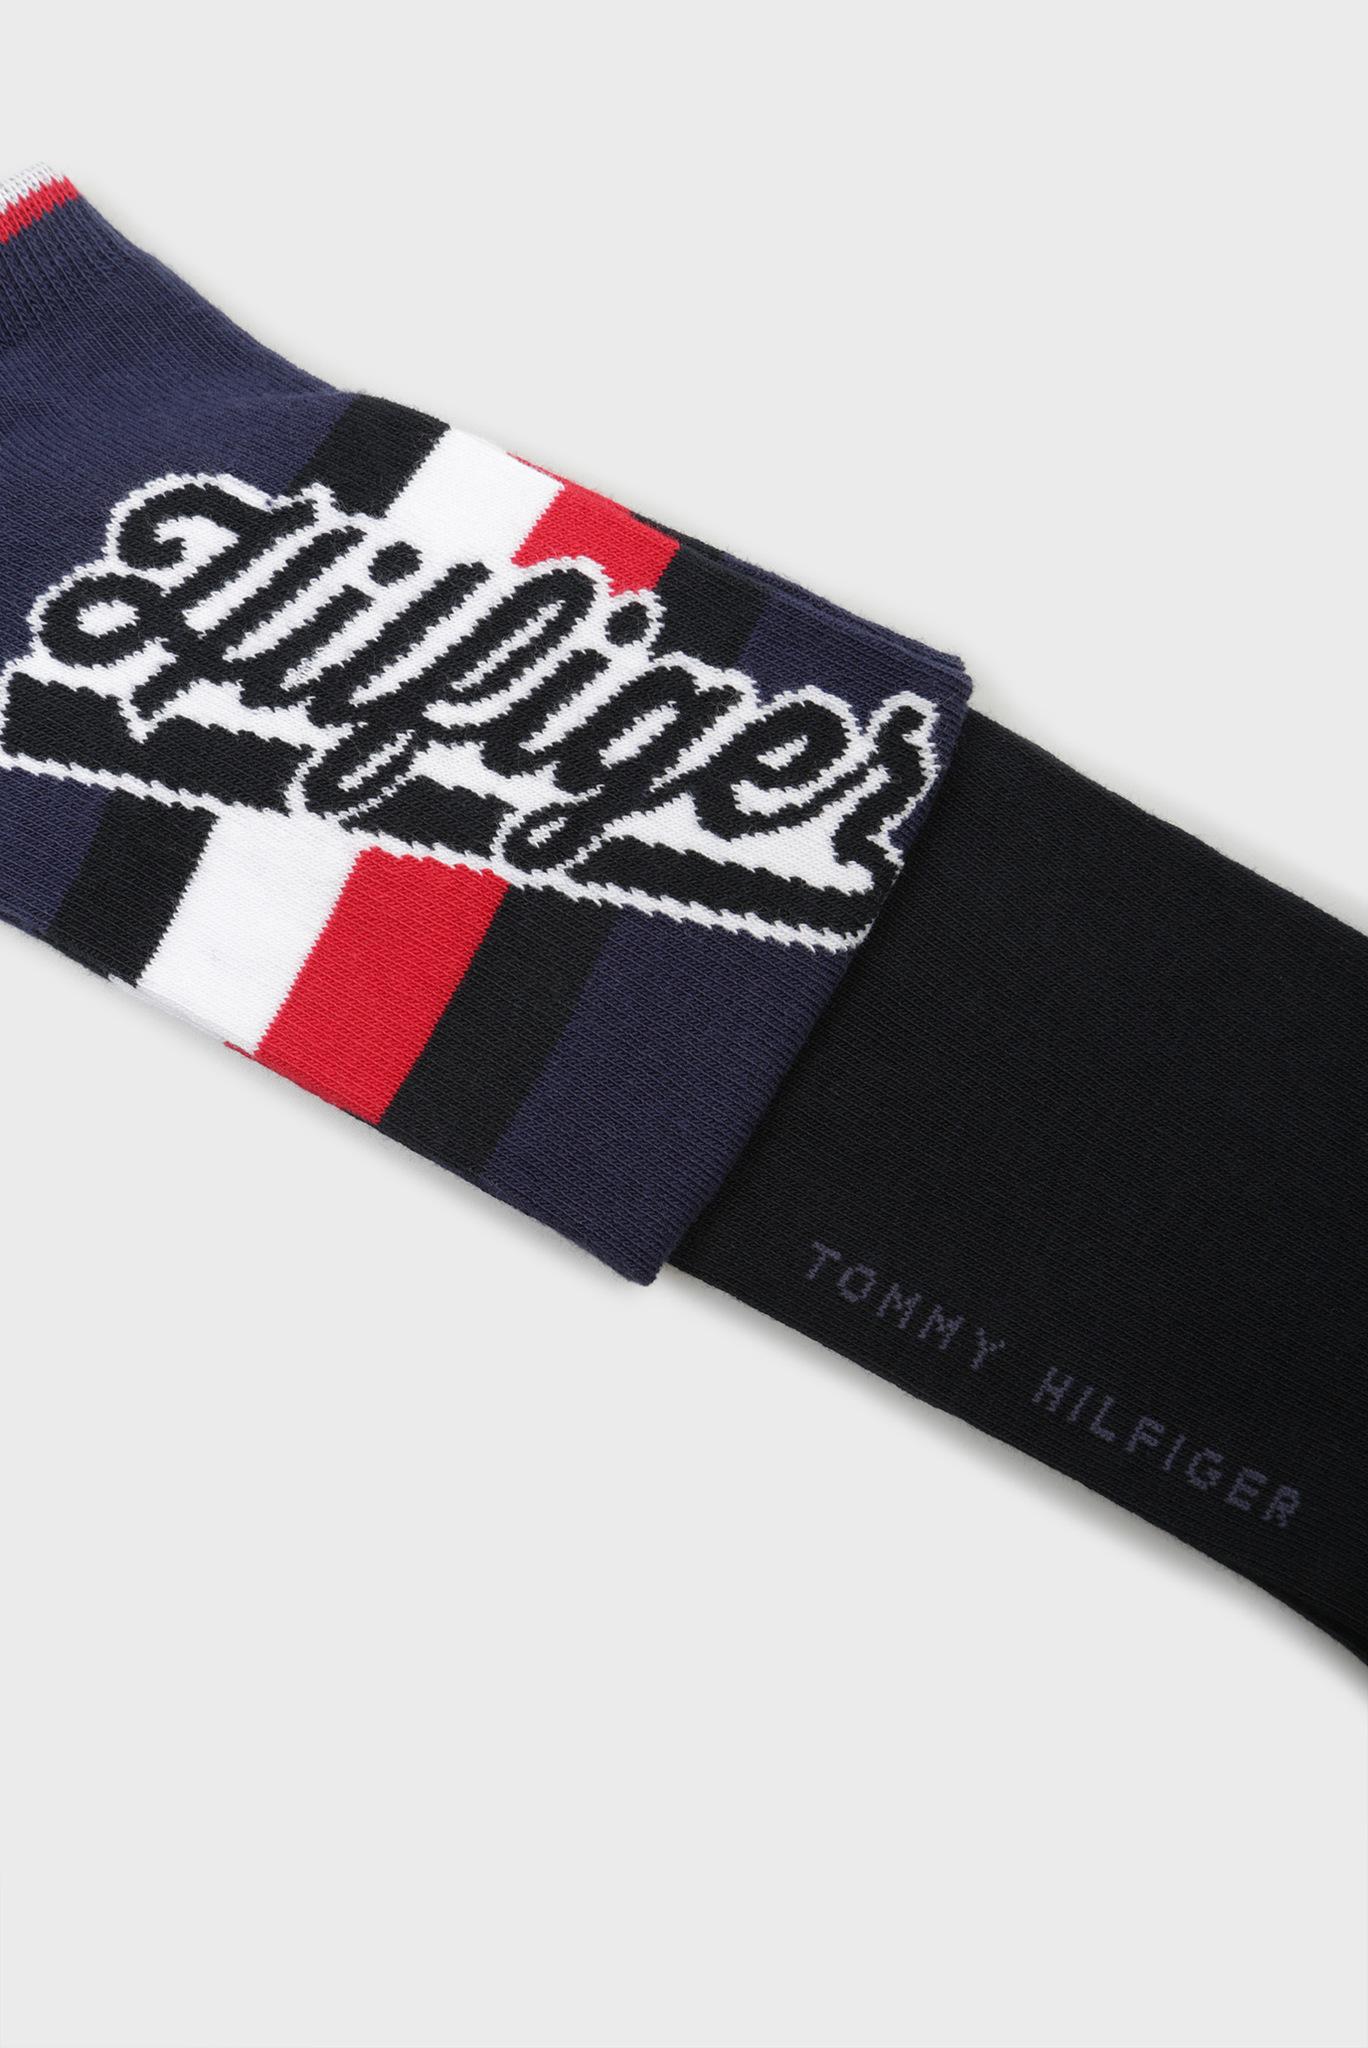 Мужские синие носки TH MEN HILFIGER SNEAKER (2 пары) Tommy Hilfiger